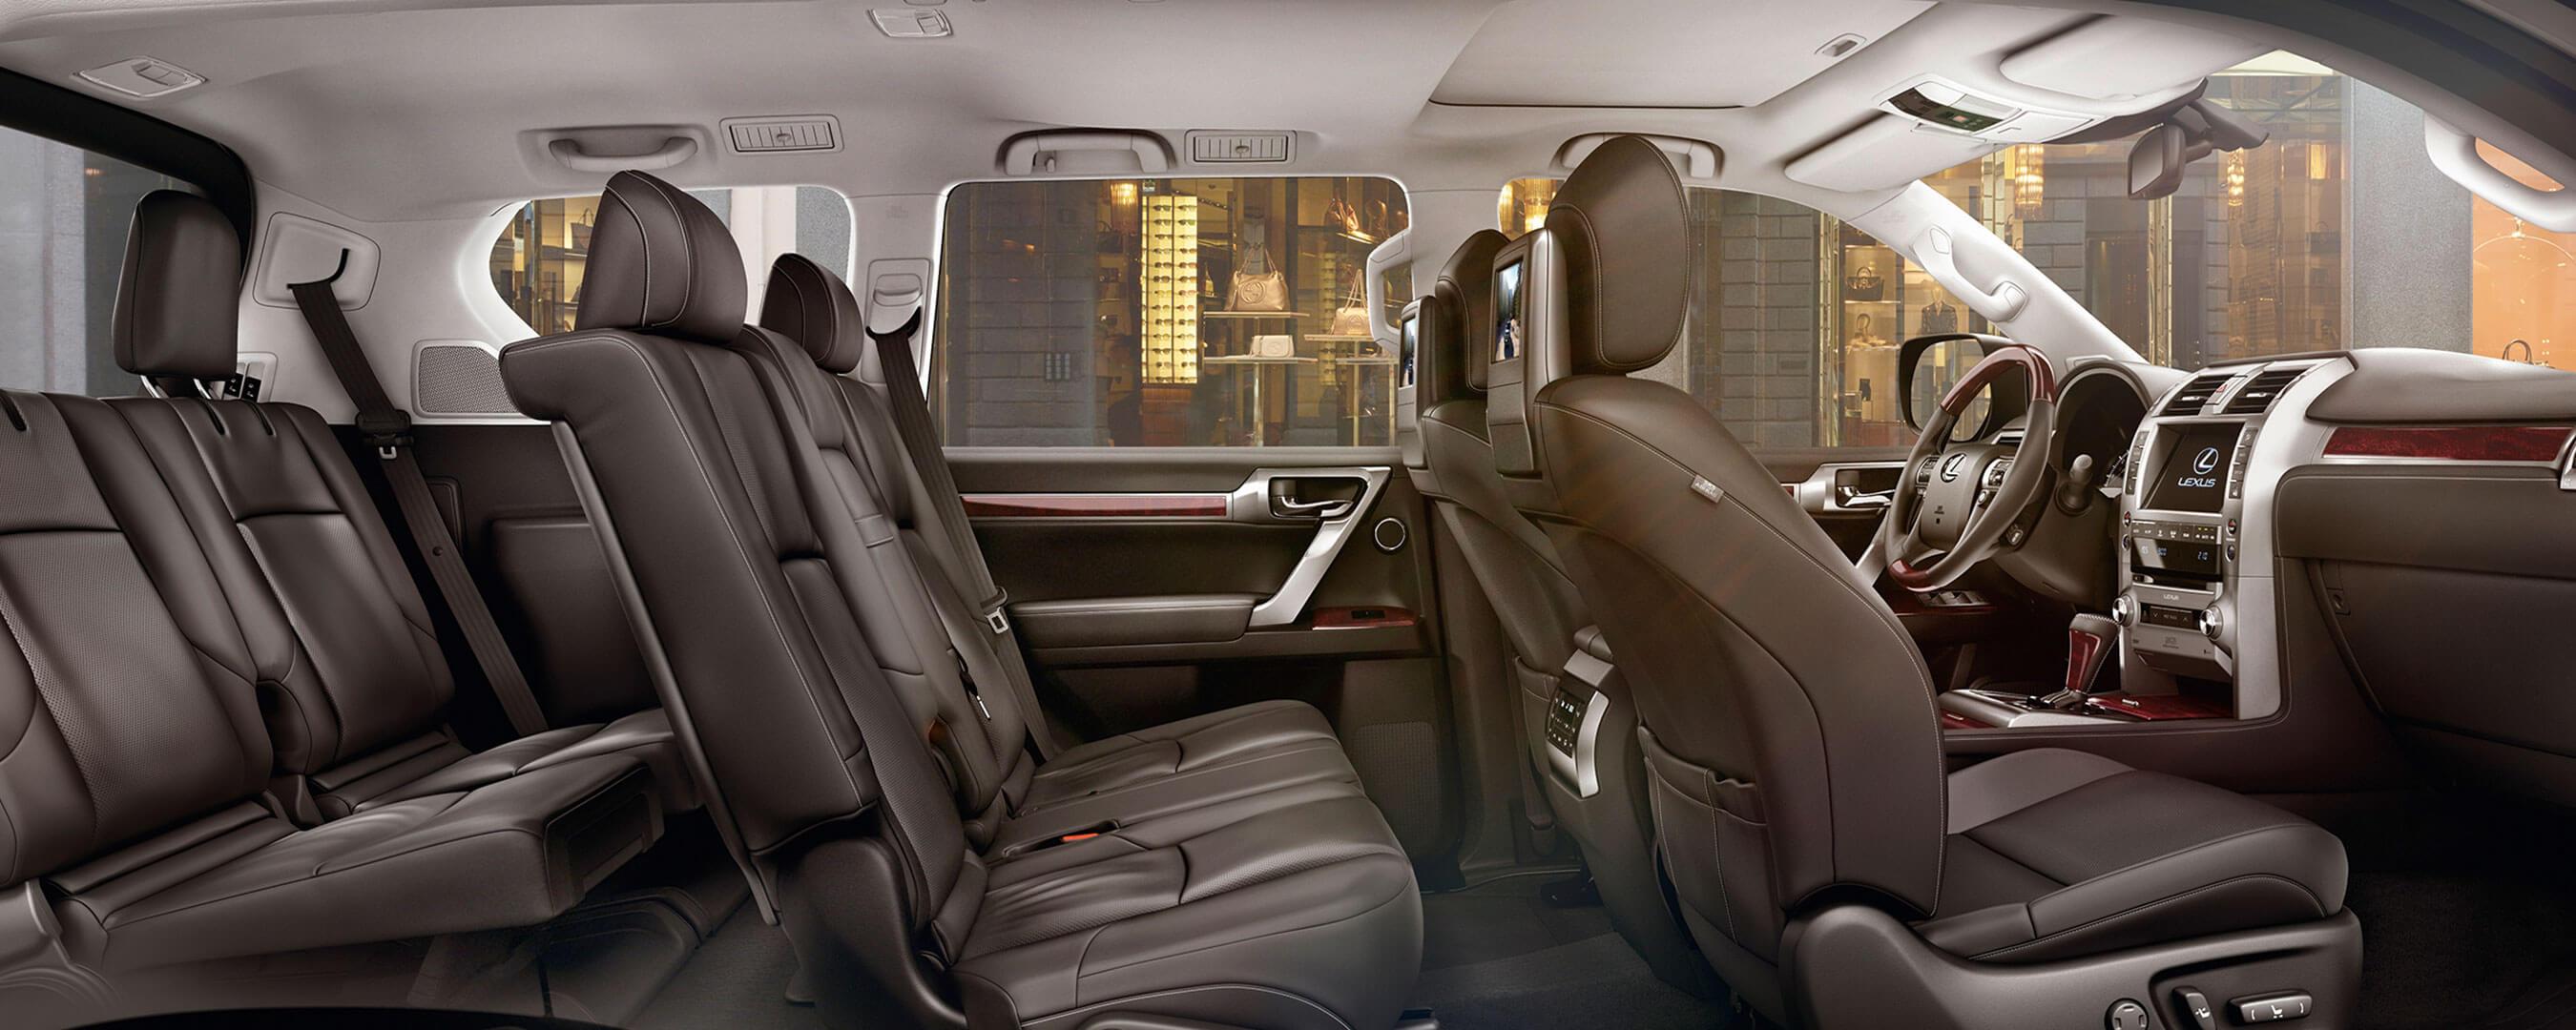 2017 lexus gx 460 experience hero interior back